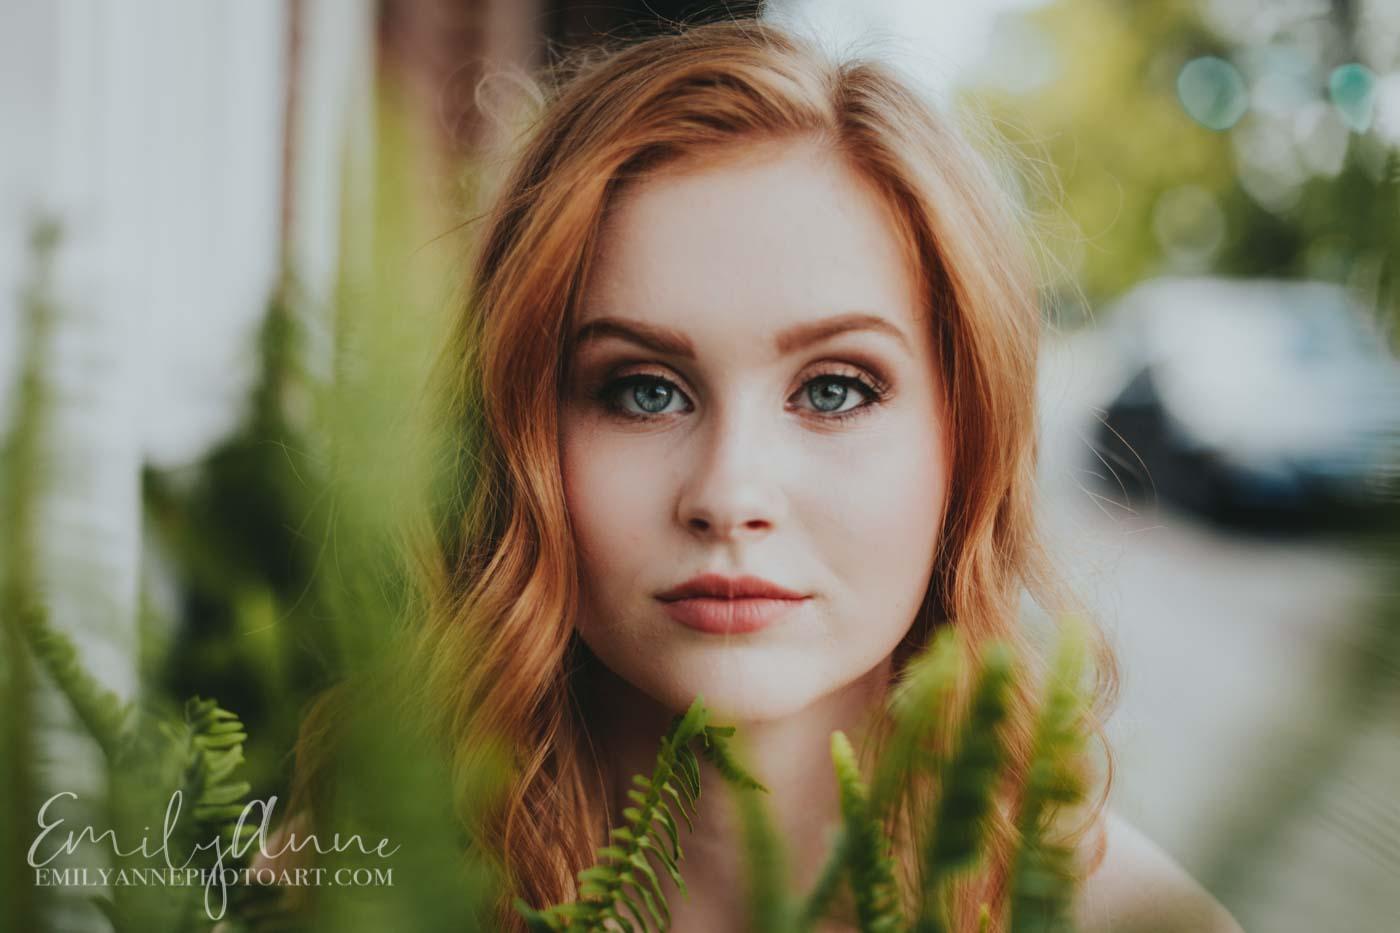 most unique senior portrait ideas shot through ferns and grass in downtown Franklin